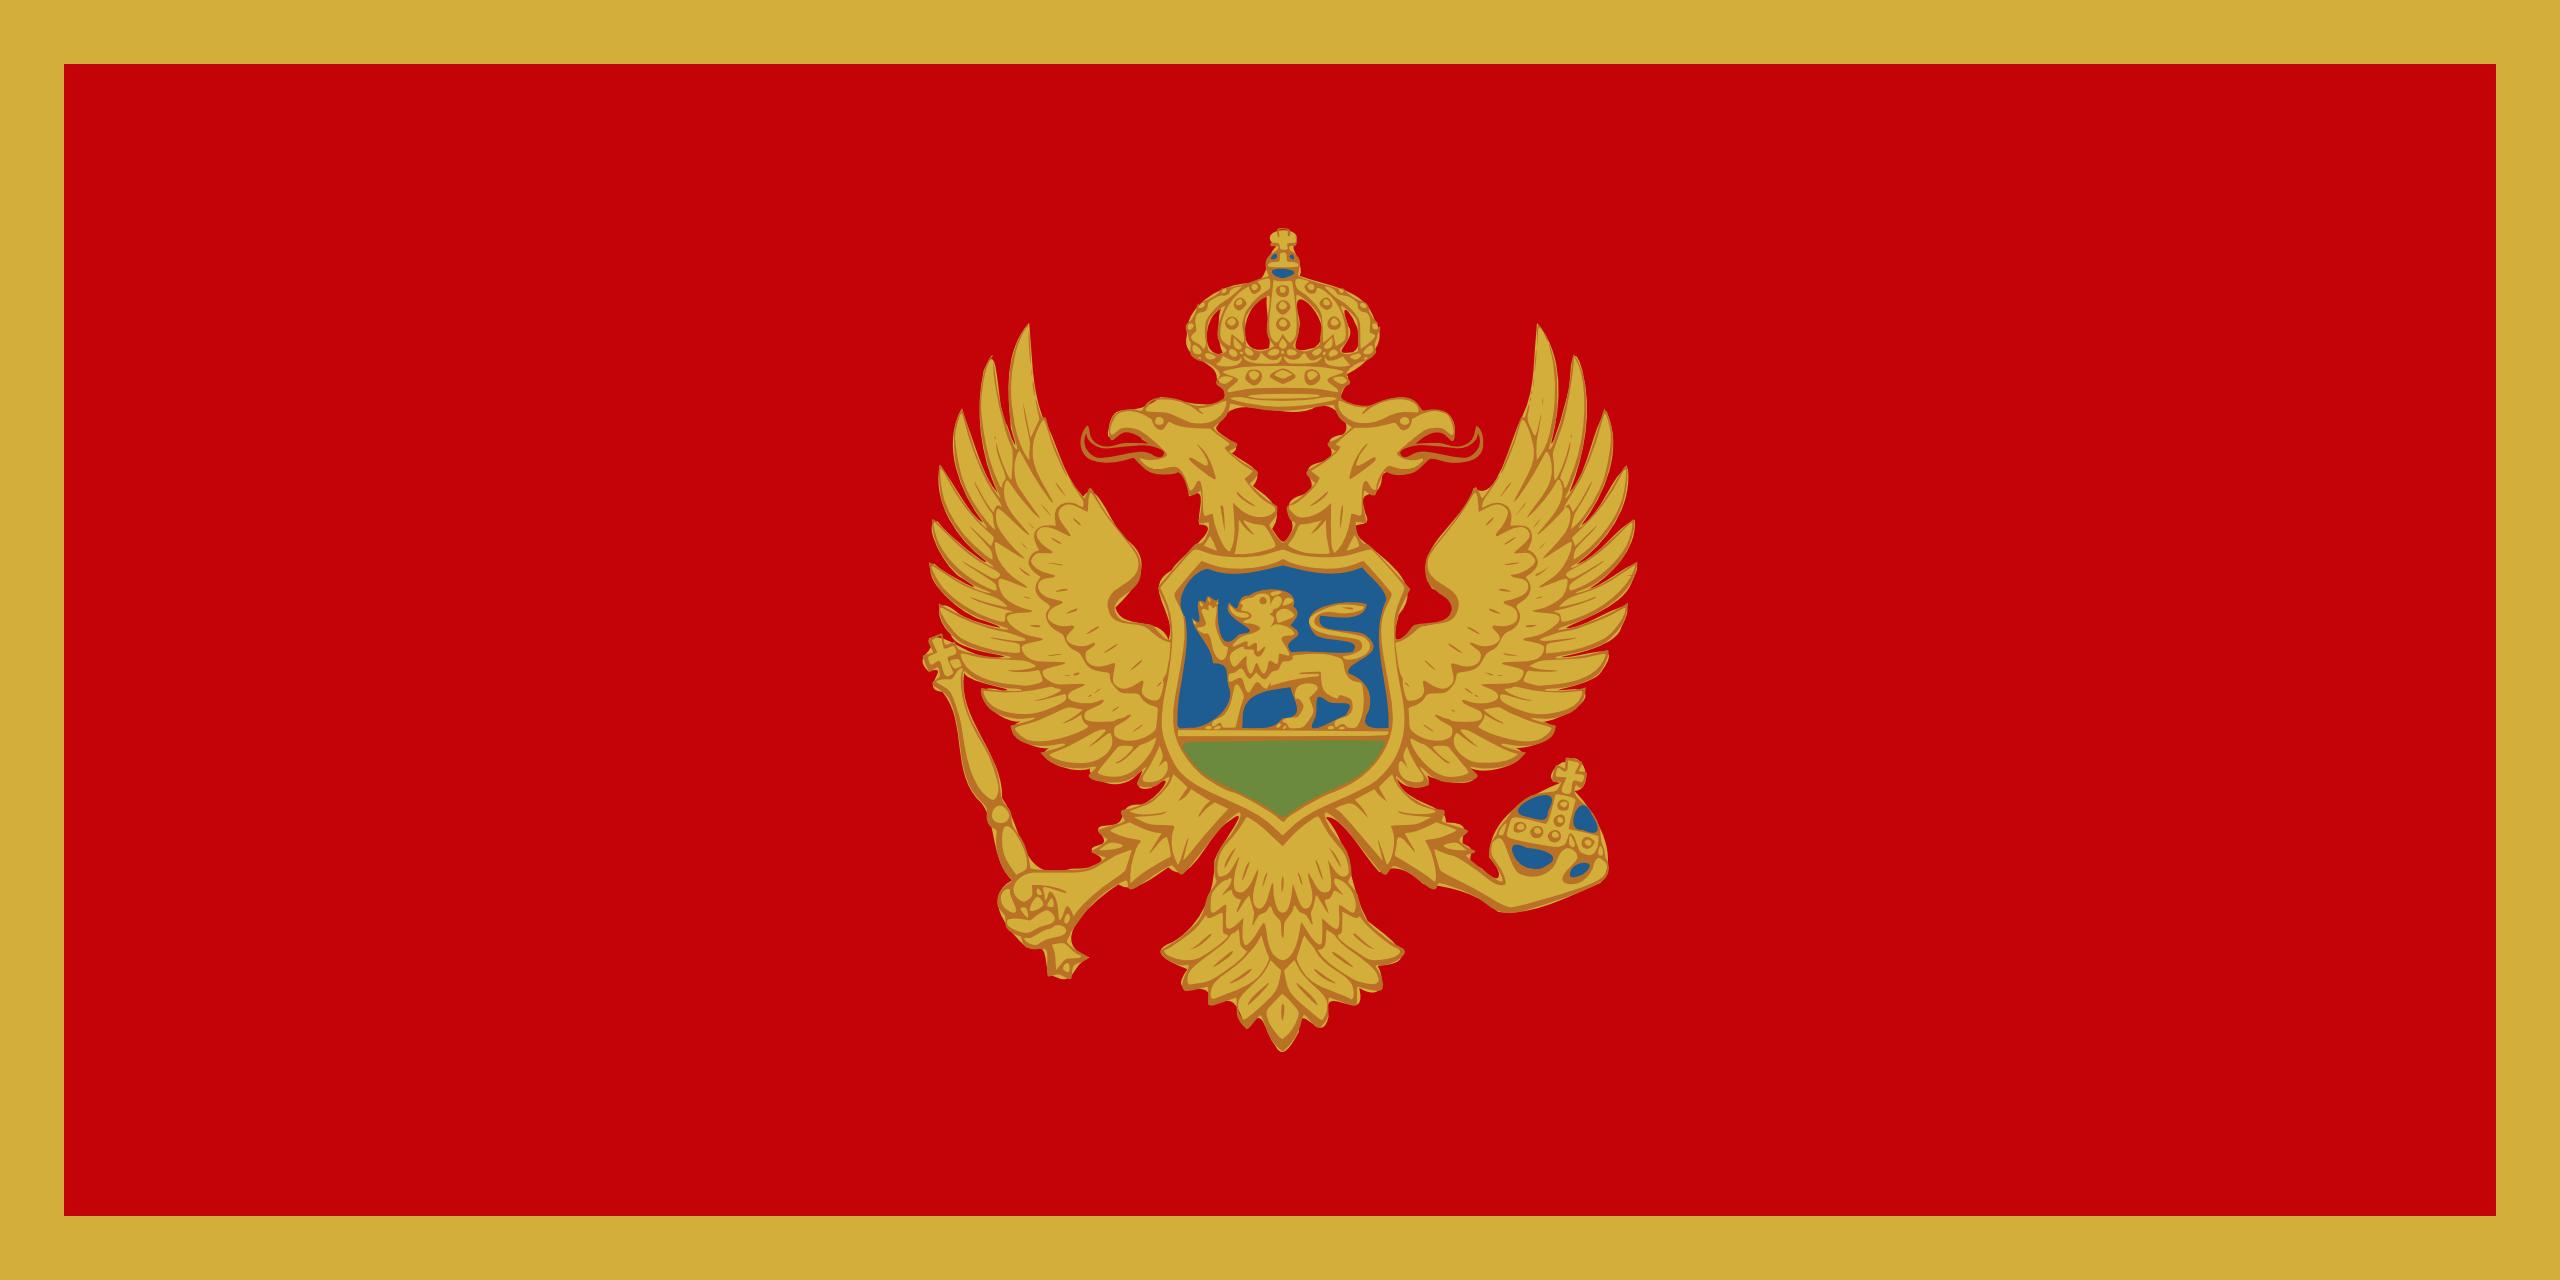 Flagi narodowe Słowian 3